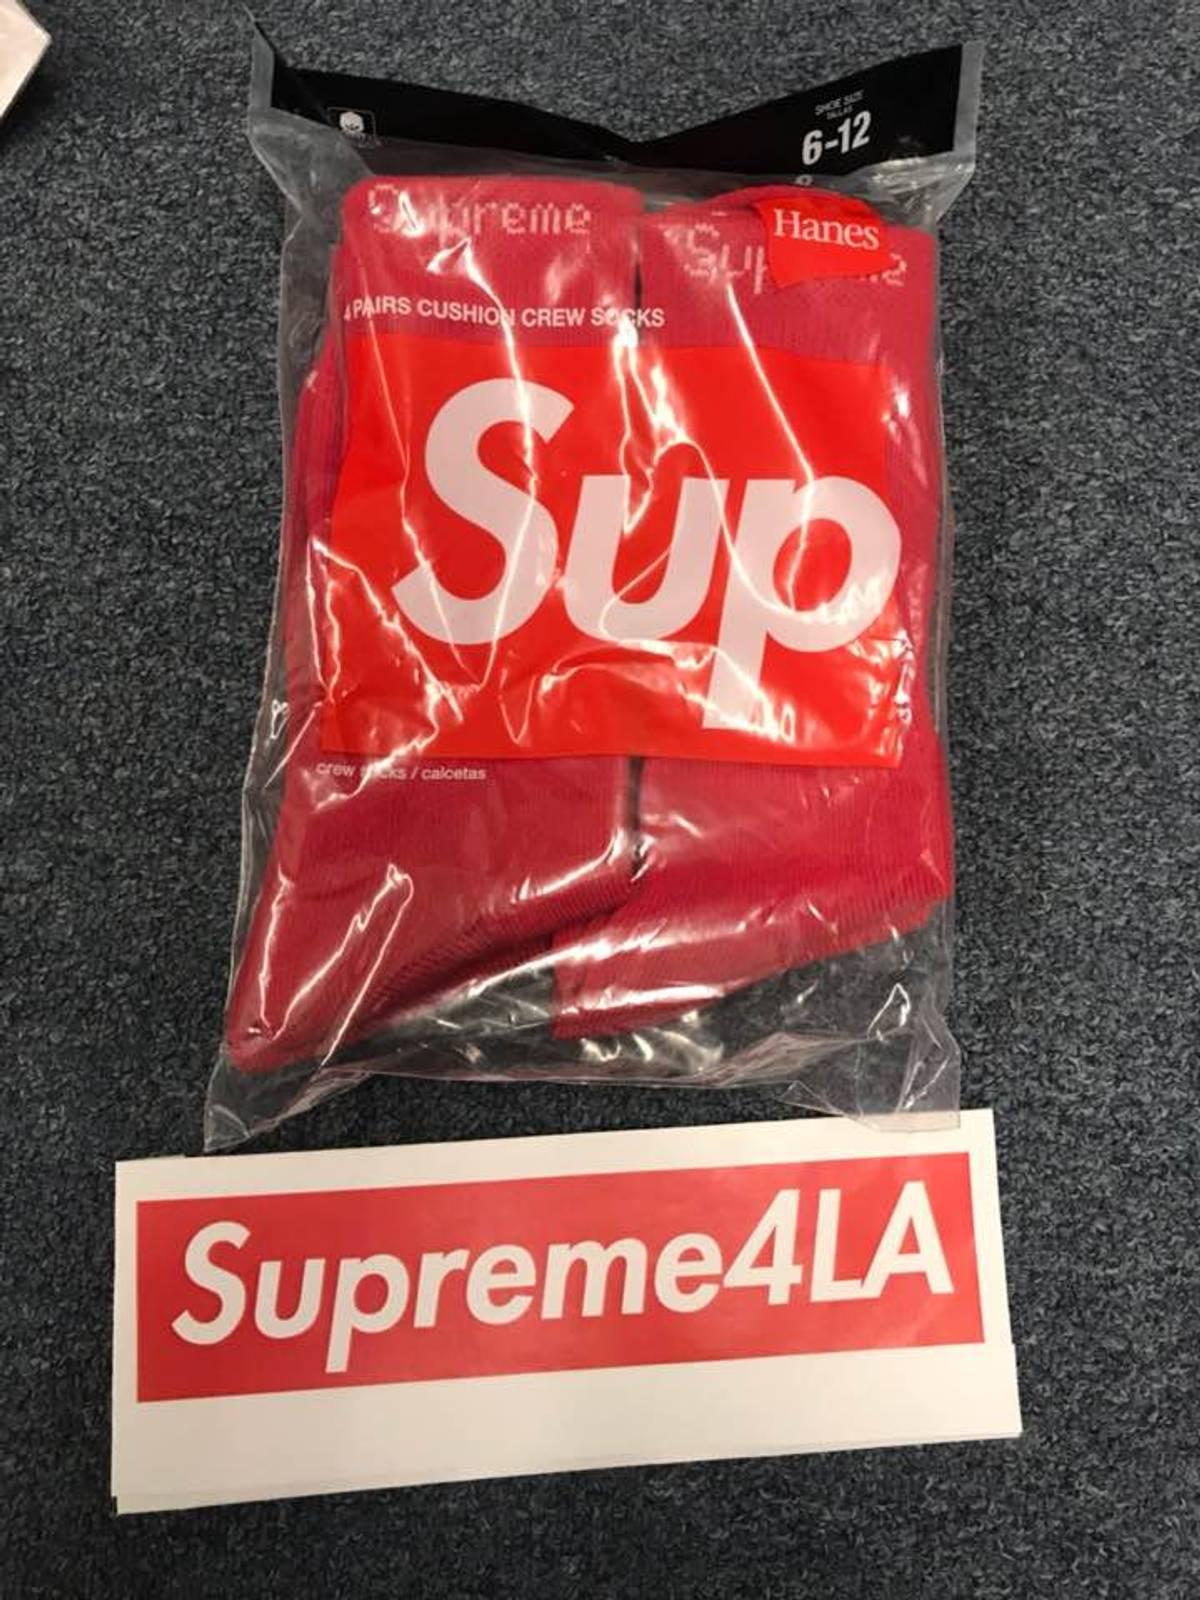 MEN/'S SUPREME SOCKS HANES CREW RED 1 PAIR BOX LOGO CLASSIC 6-12 FW19 BRAND NEW